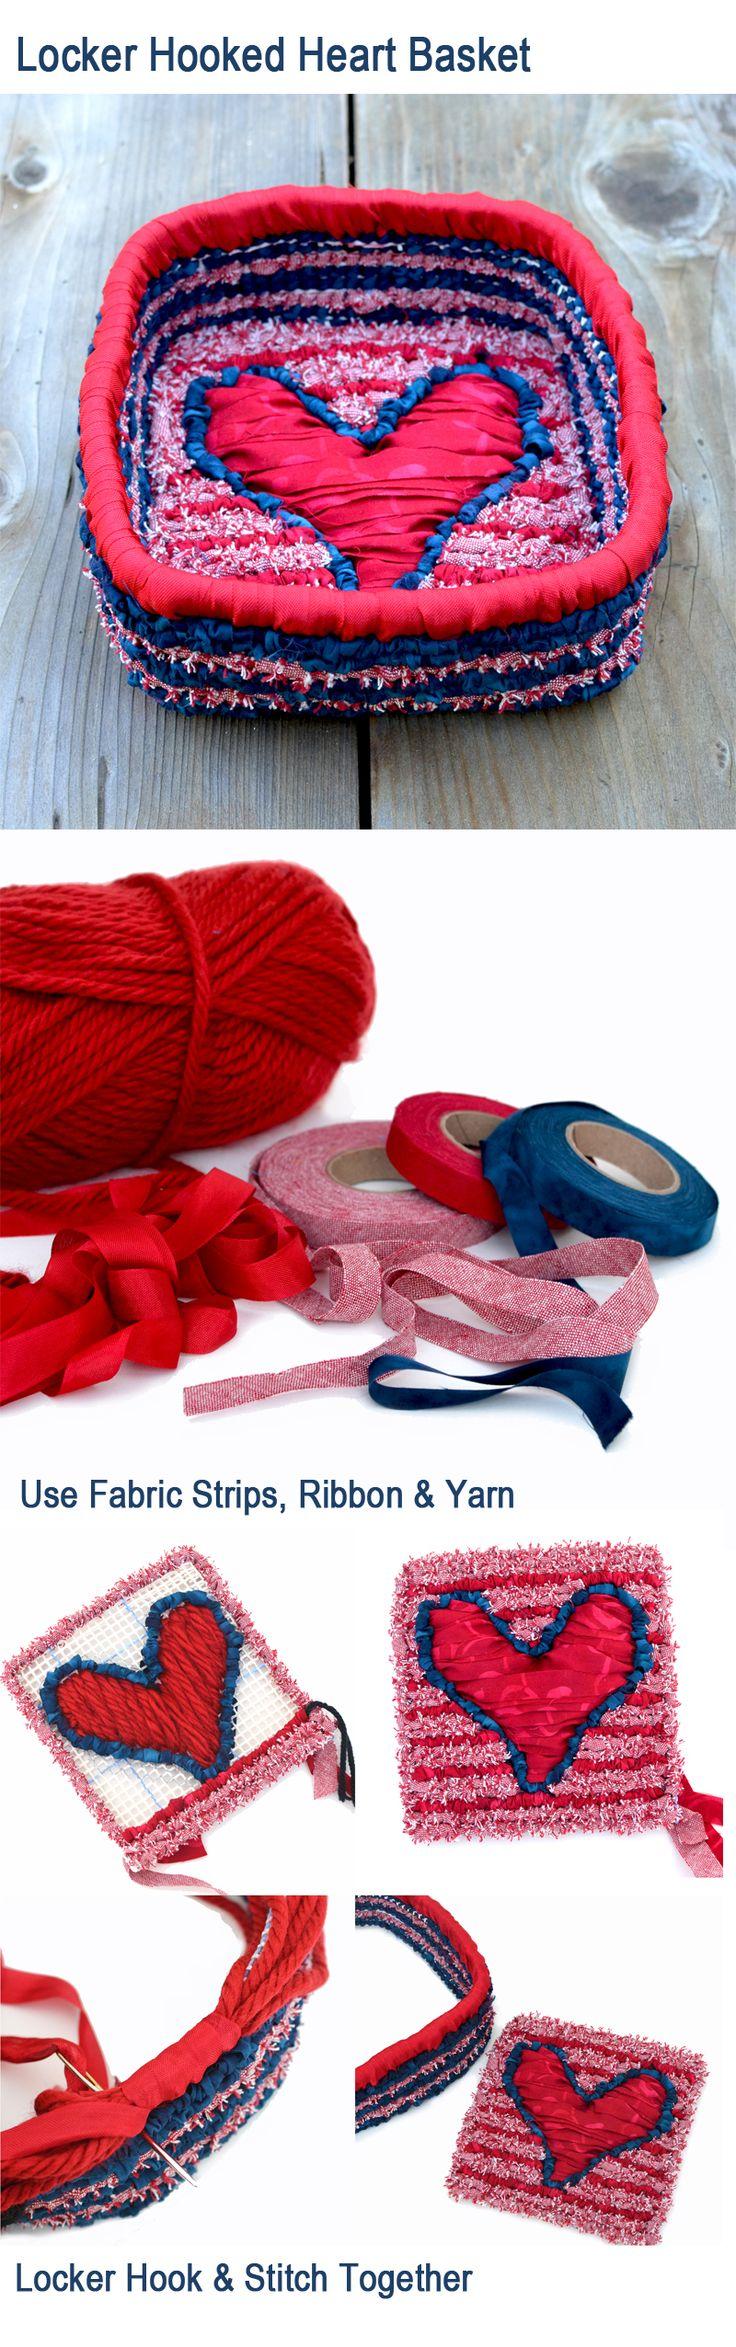 Locker Hooked Heart Trinkets Basket - Free Pattern from Color Crazy - colorcrazy.com